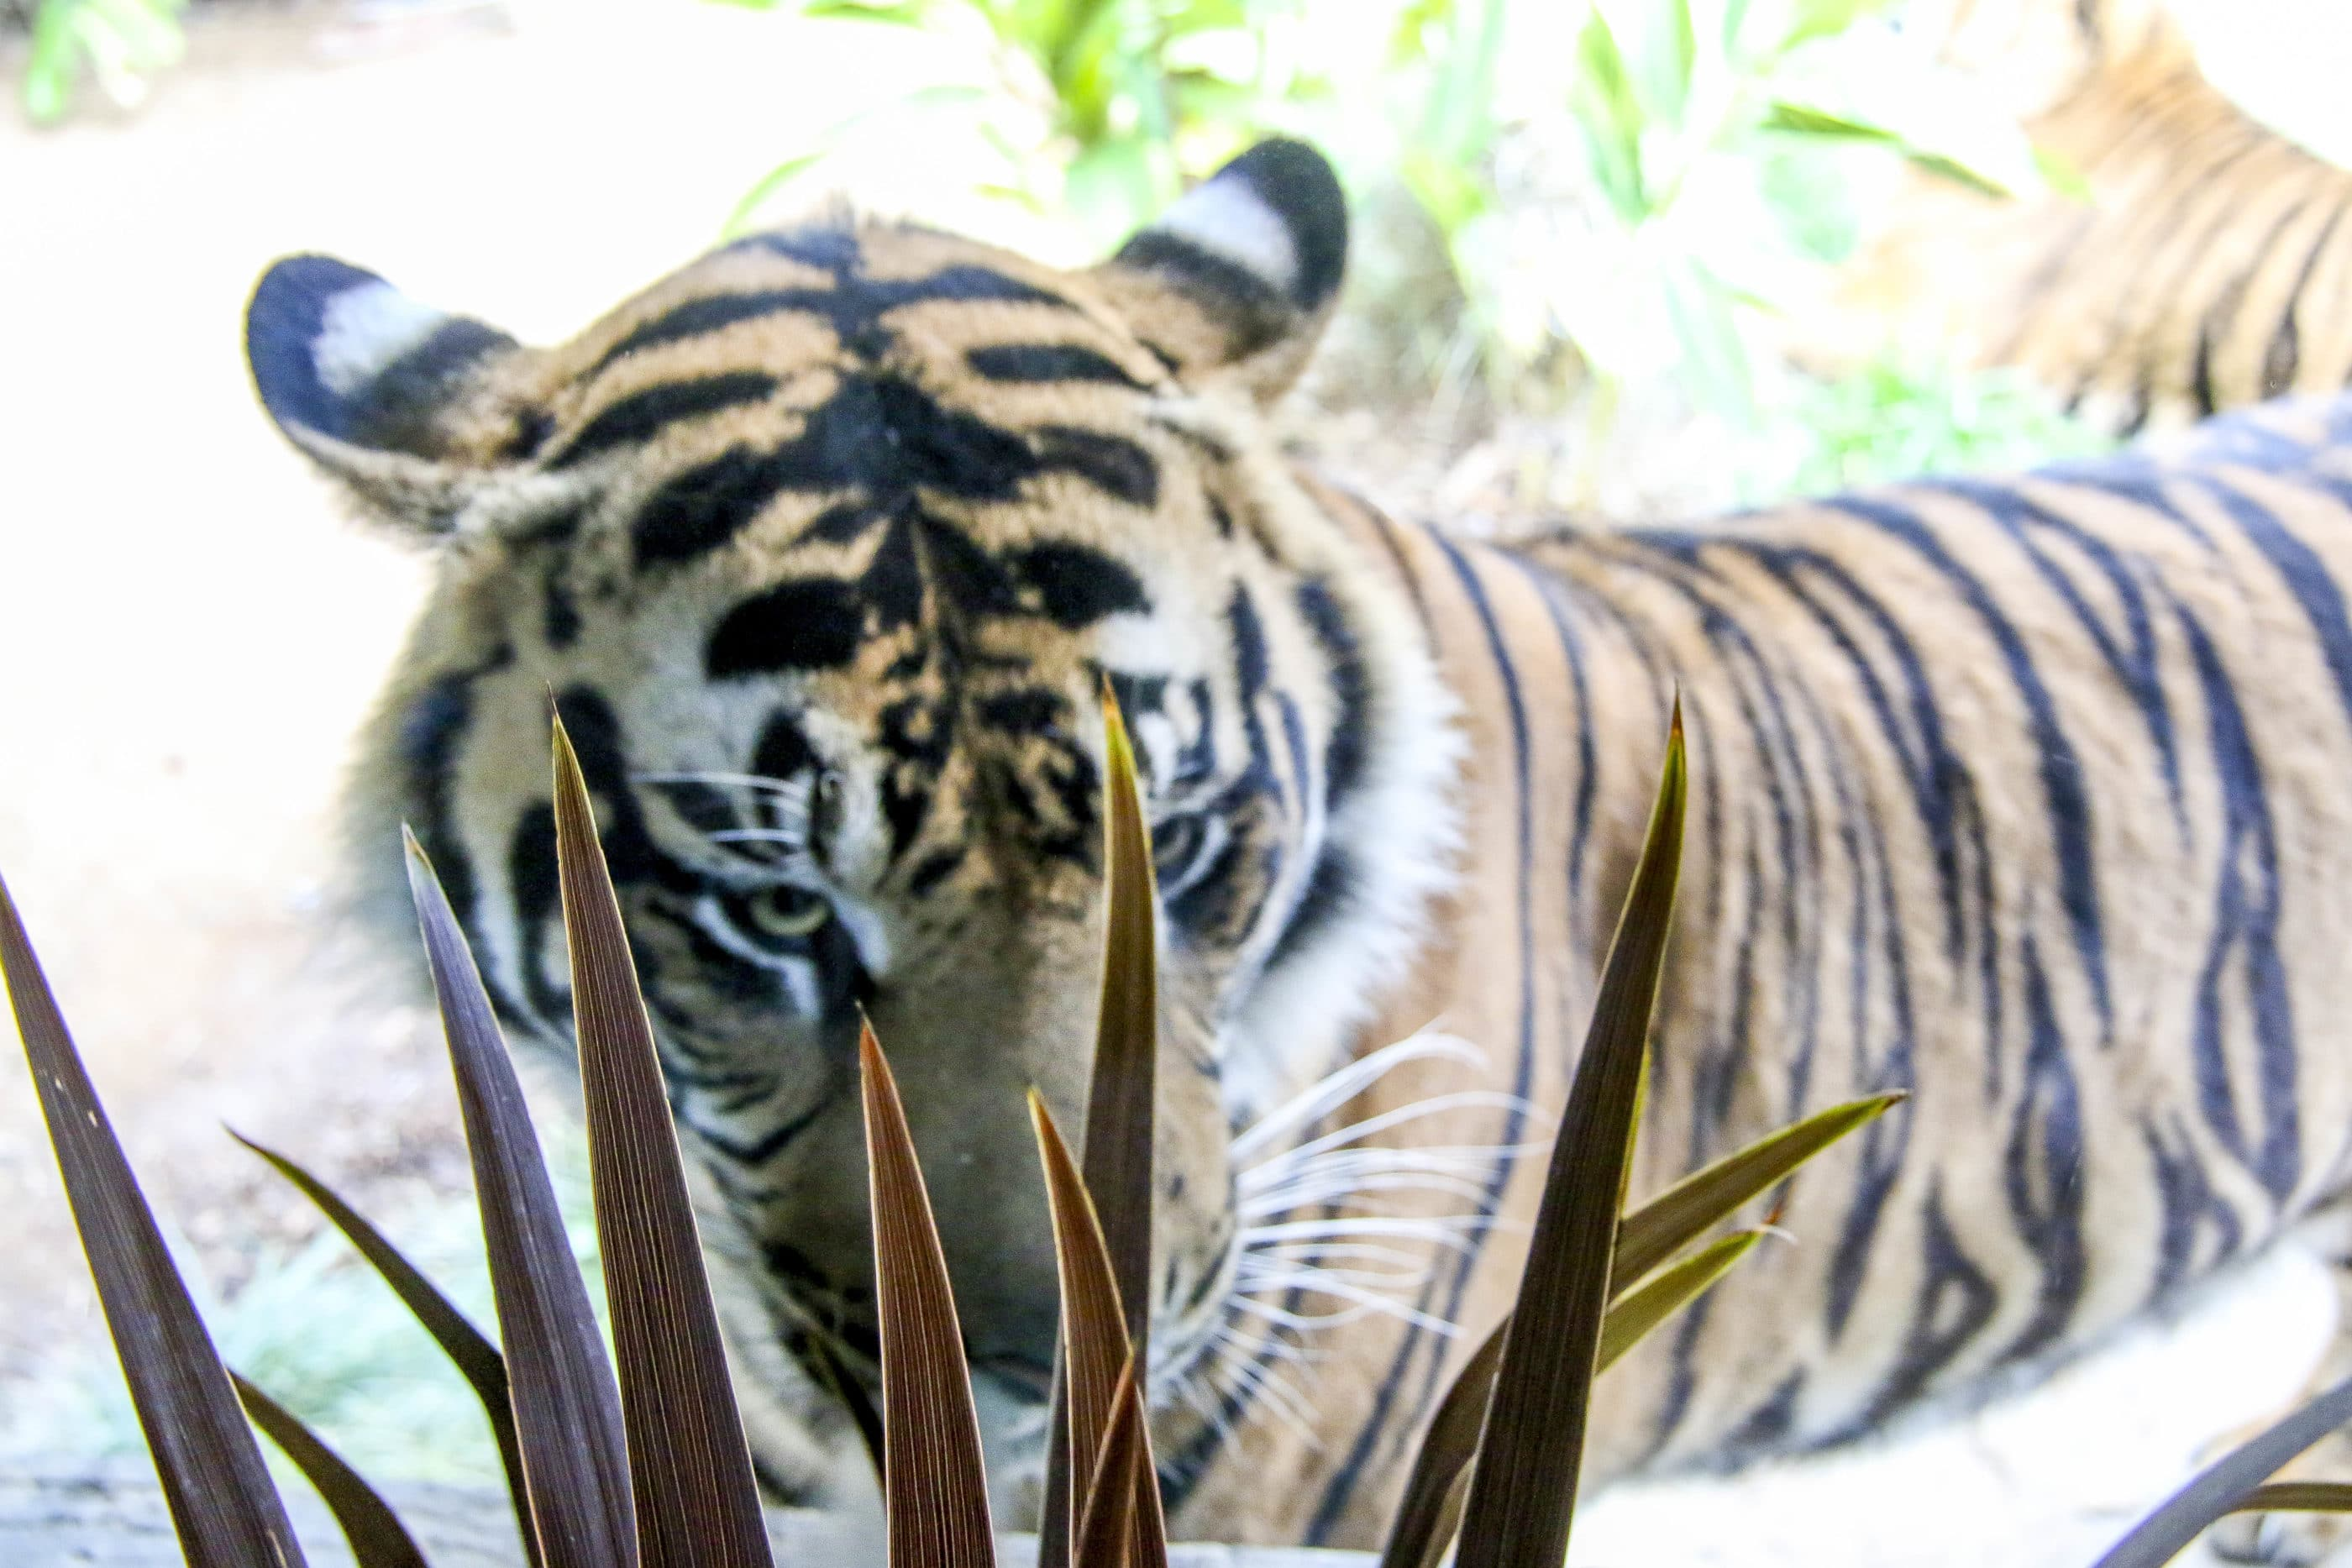 A Sumatran tiger looks through the window at The Sambutan Longhouse.